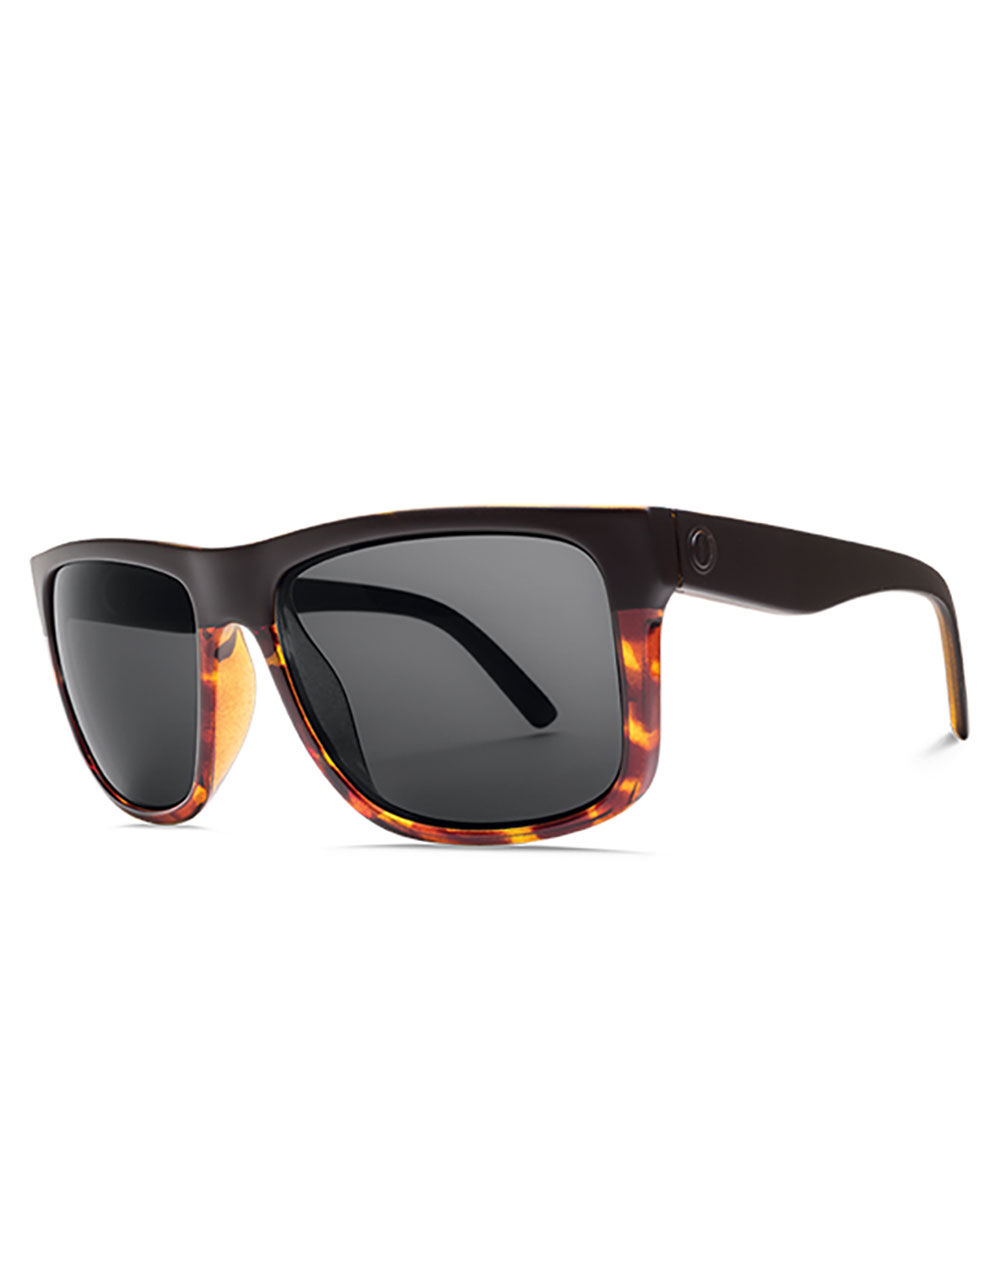 ELECTRIC Swingarm XL Darkside Polarized Sunglasses